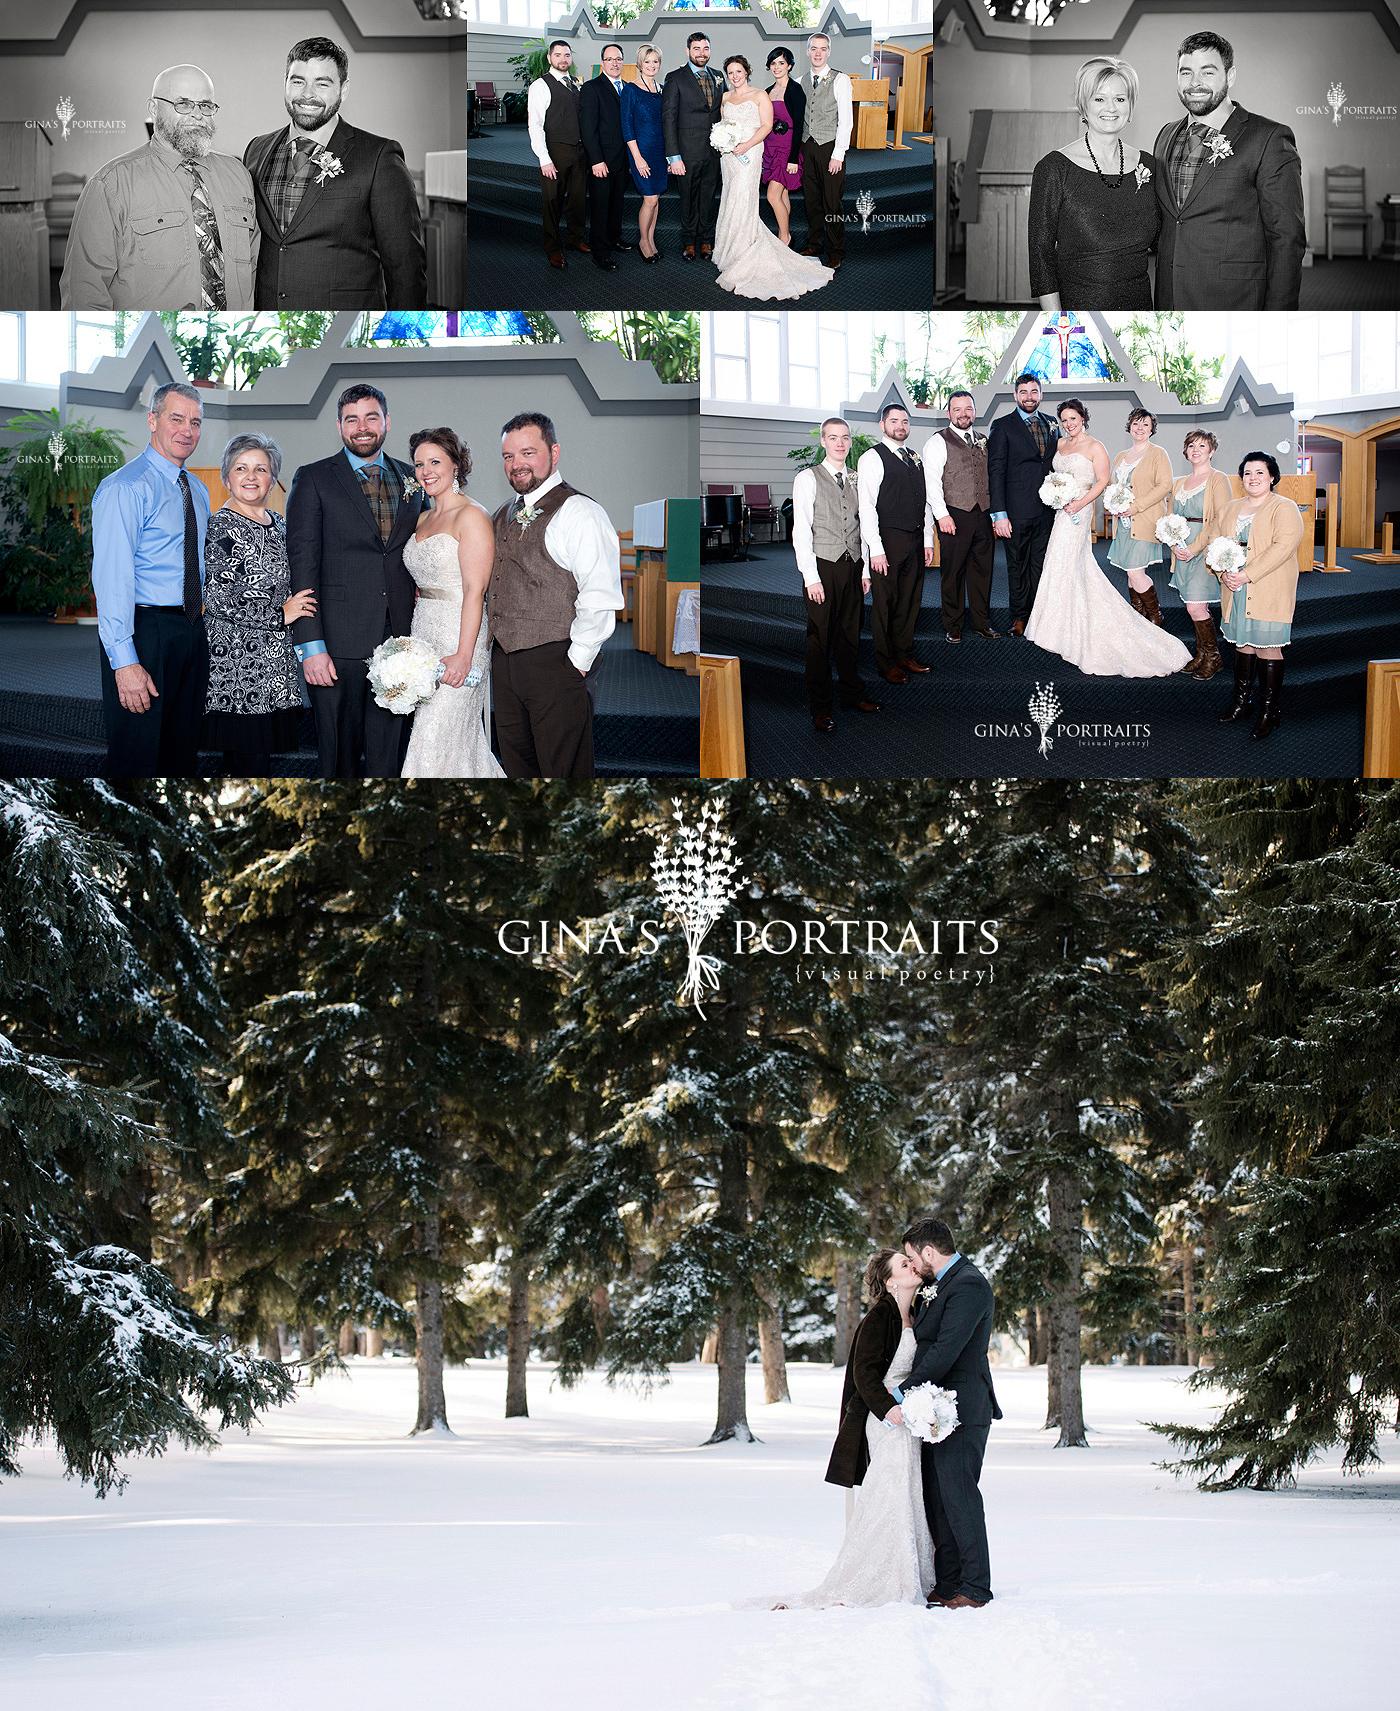 Saskatoon_Wedding_Photographer13